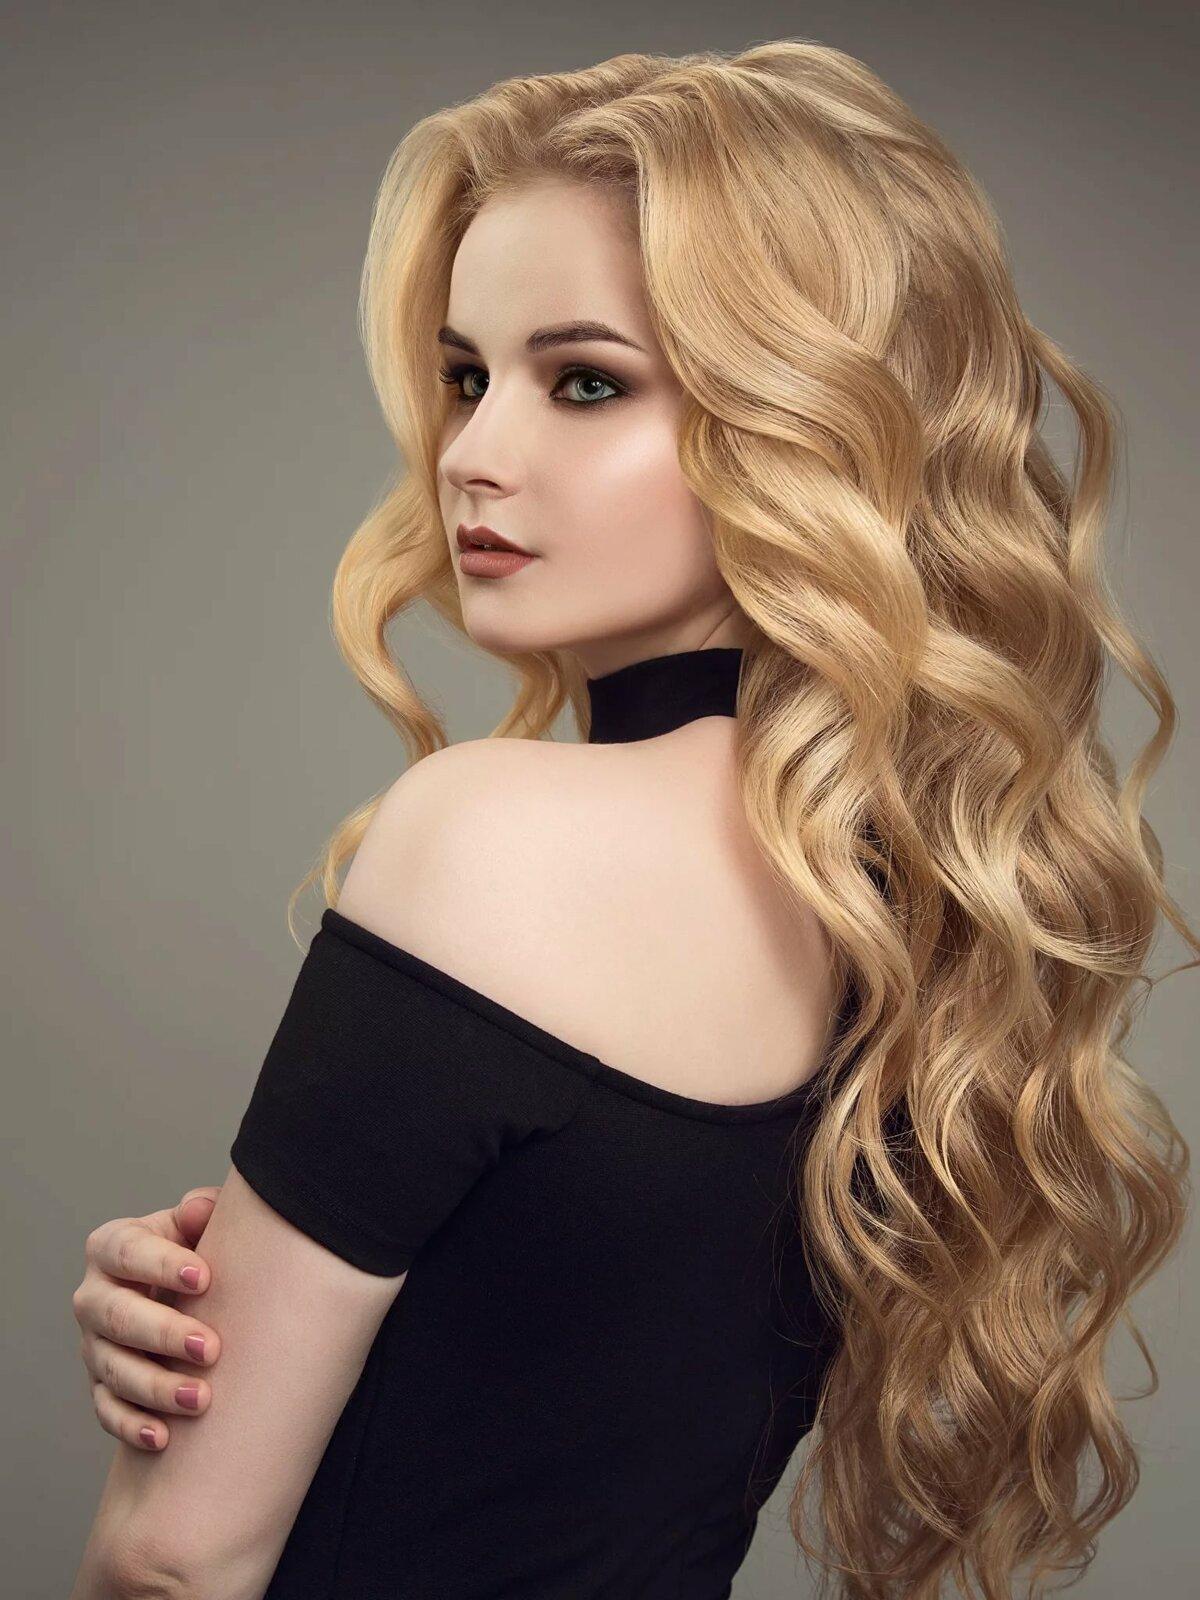 Картинки причесок блондинок